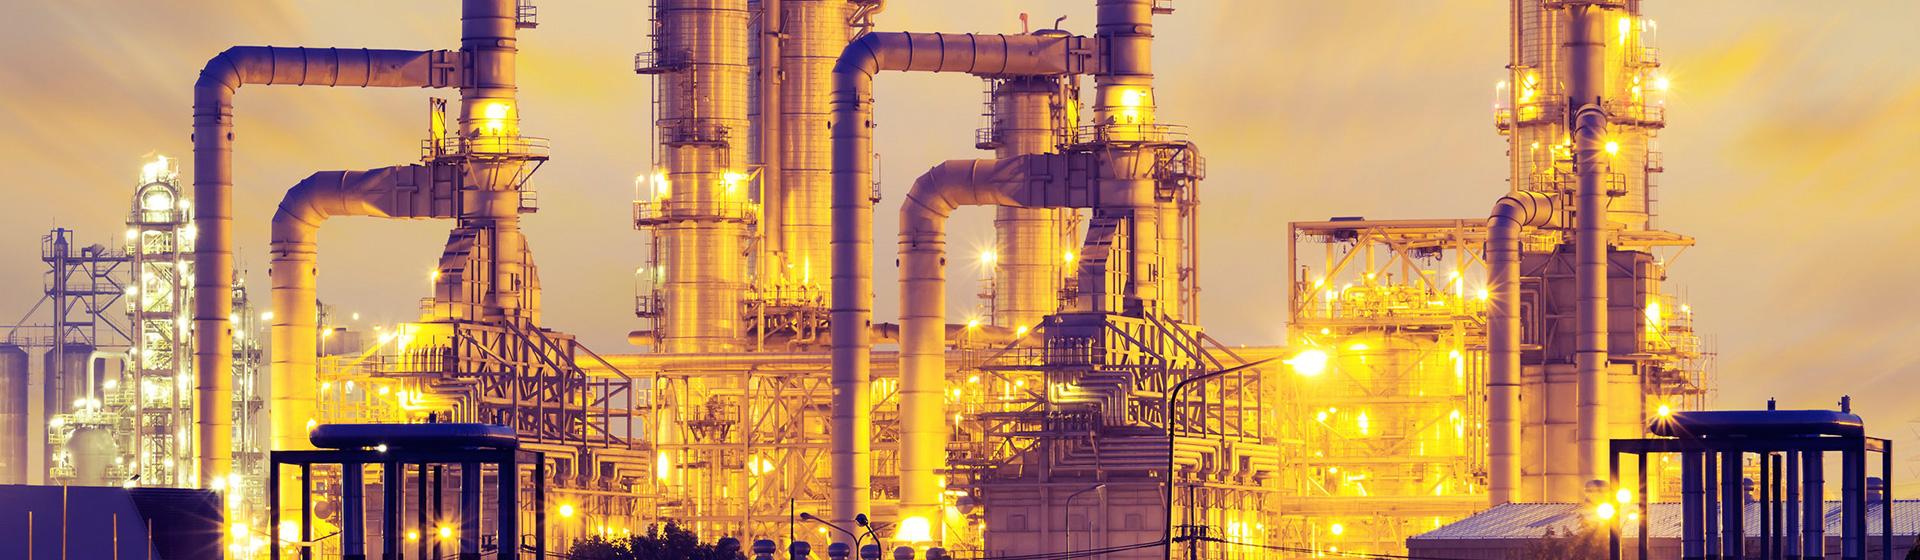 banner_mini_refineries